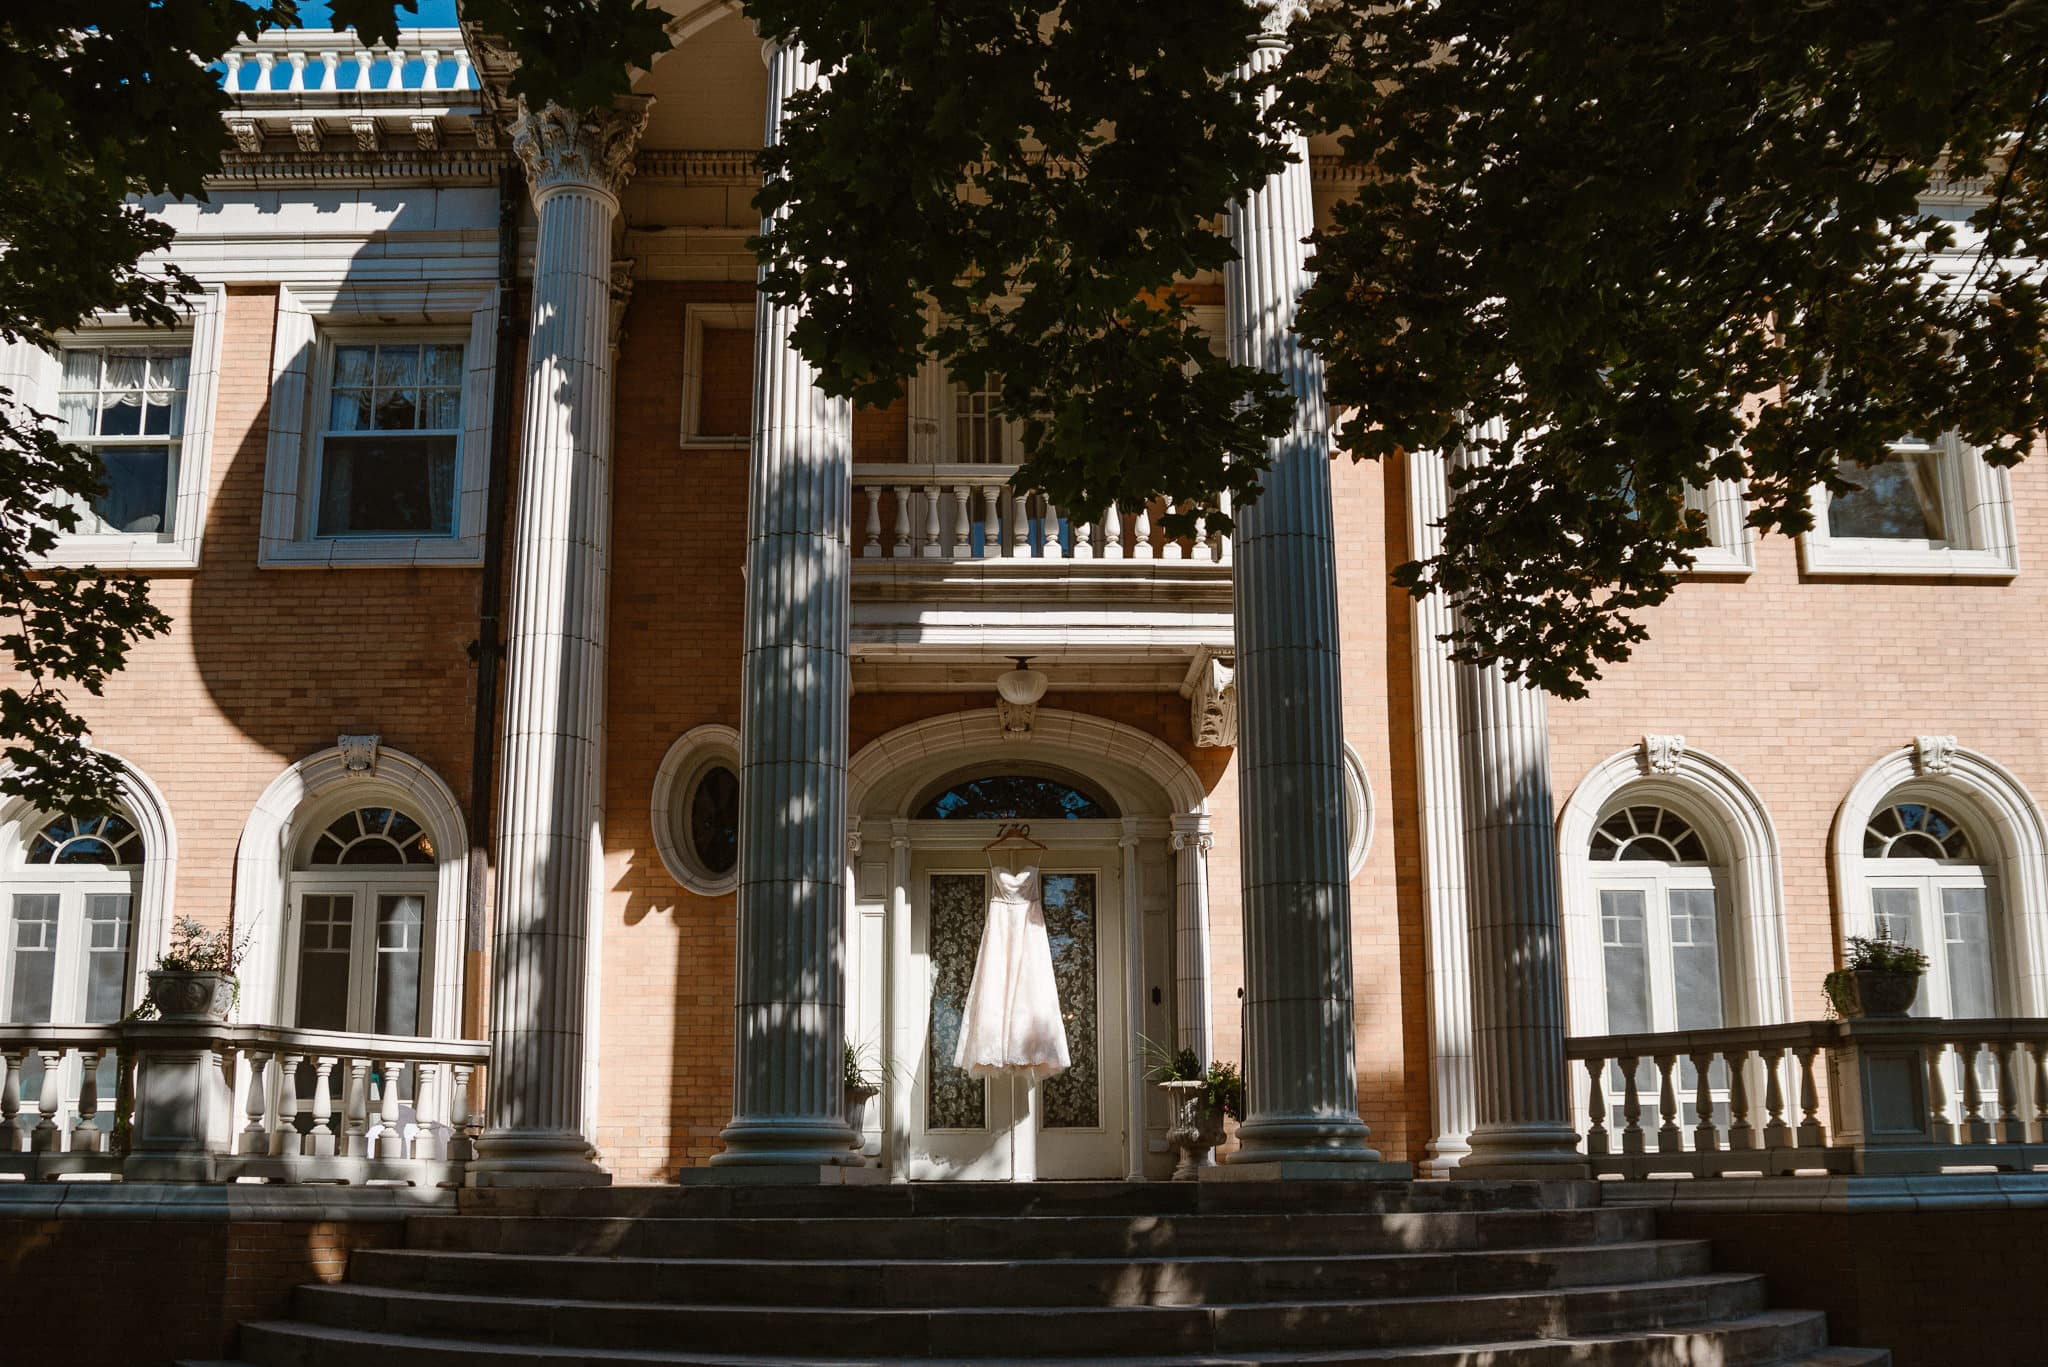 Grant Humphreys Mansion Wedding Photographer, Denver wedding photographer, Colorado wedding photographer, wedding dress